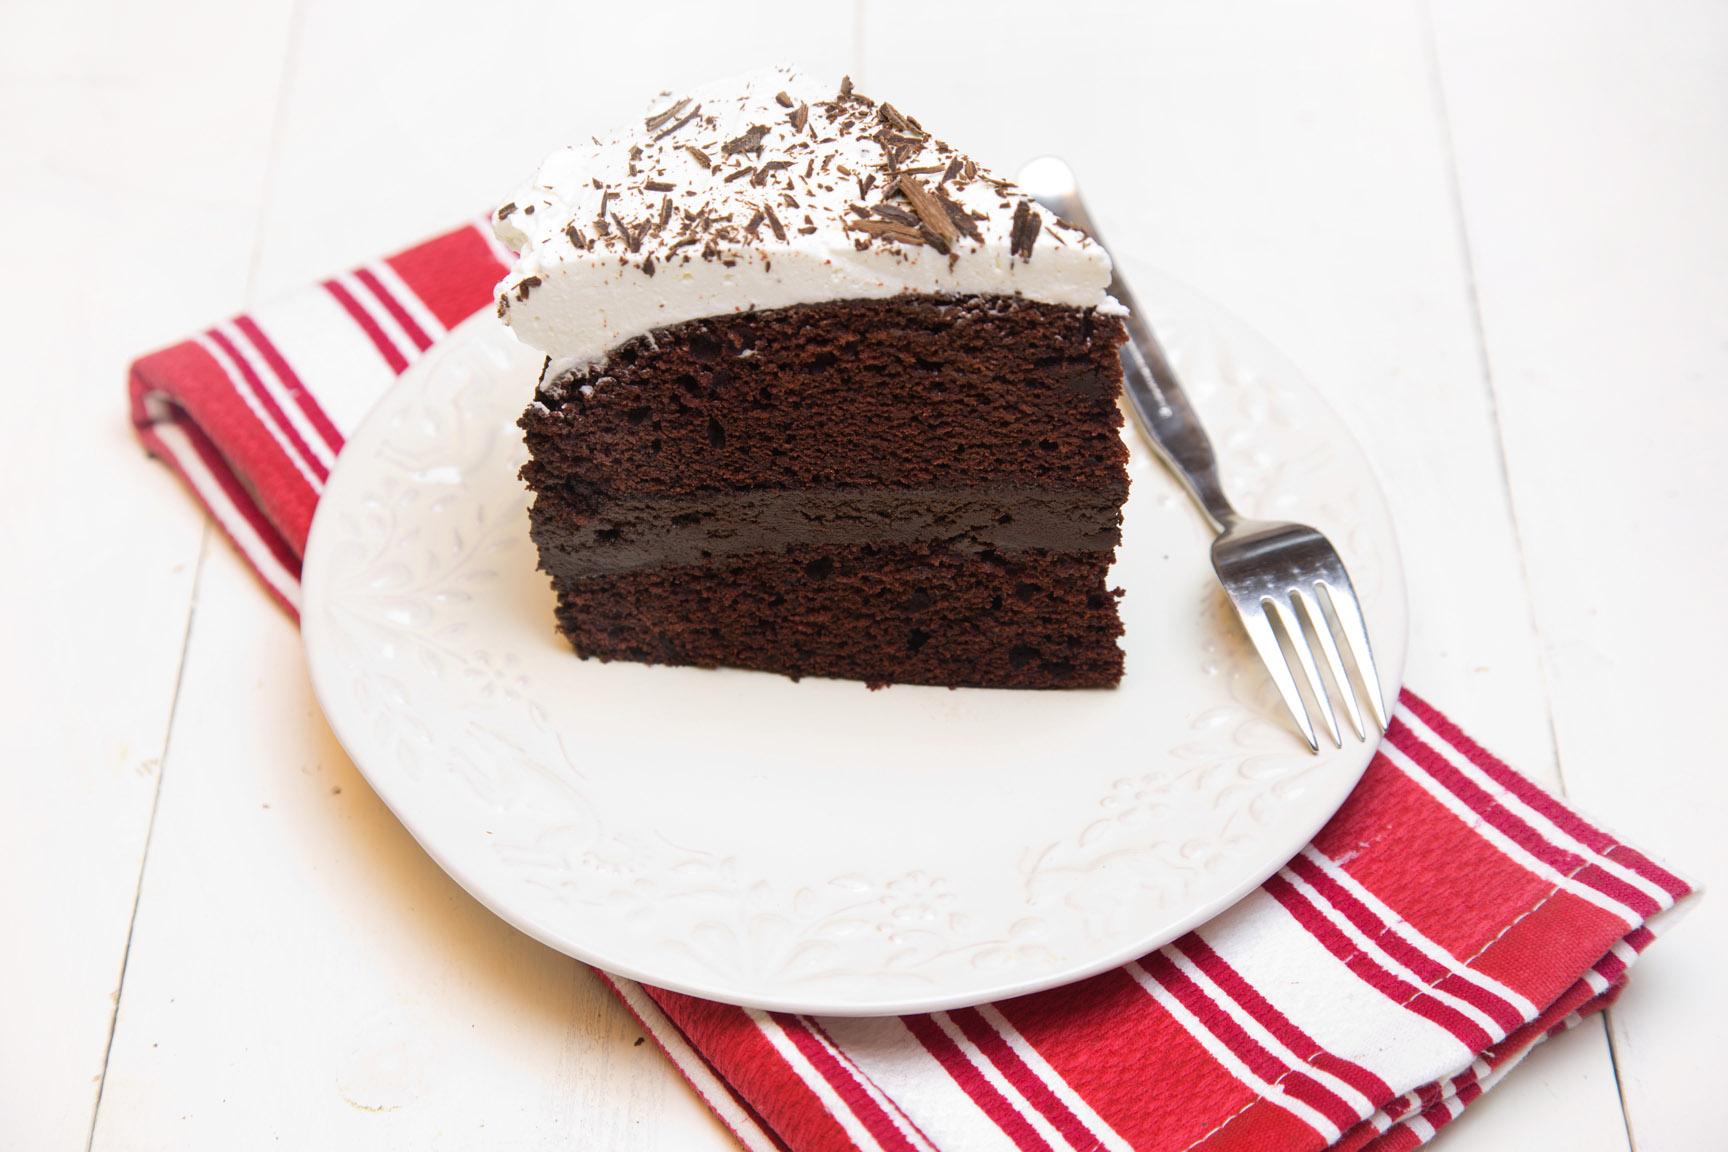 Chef Dennis' Chocolate Fudge Cake